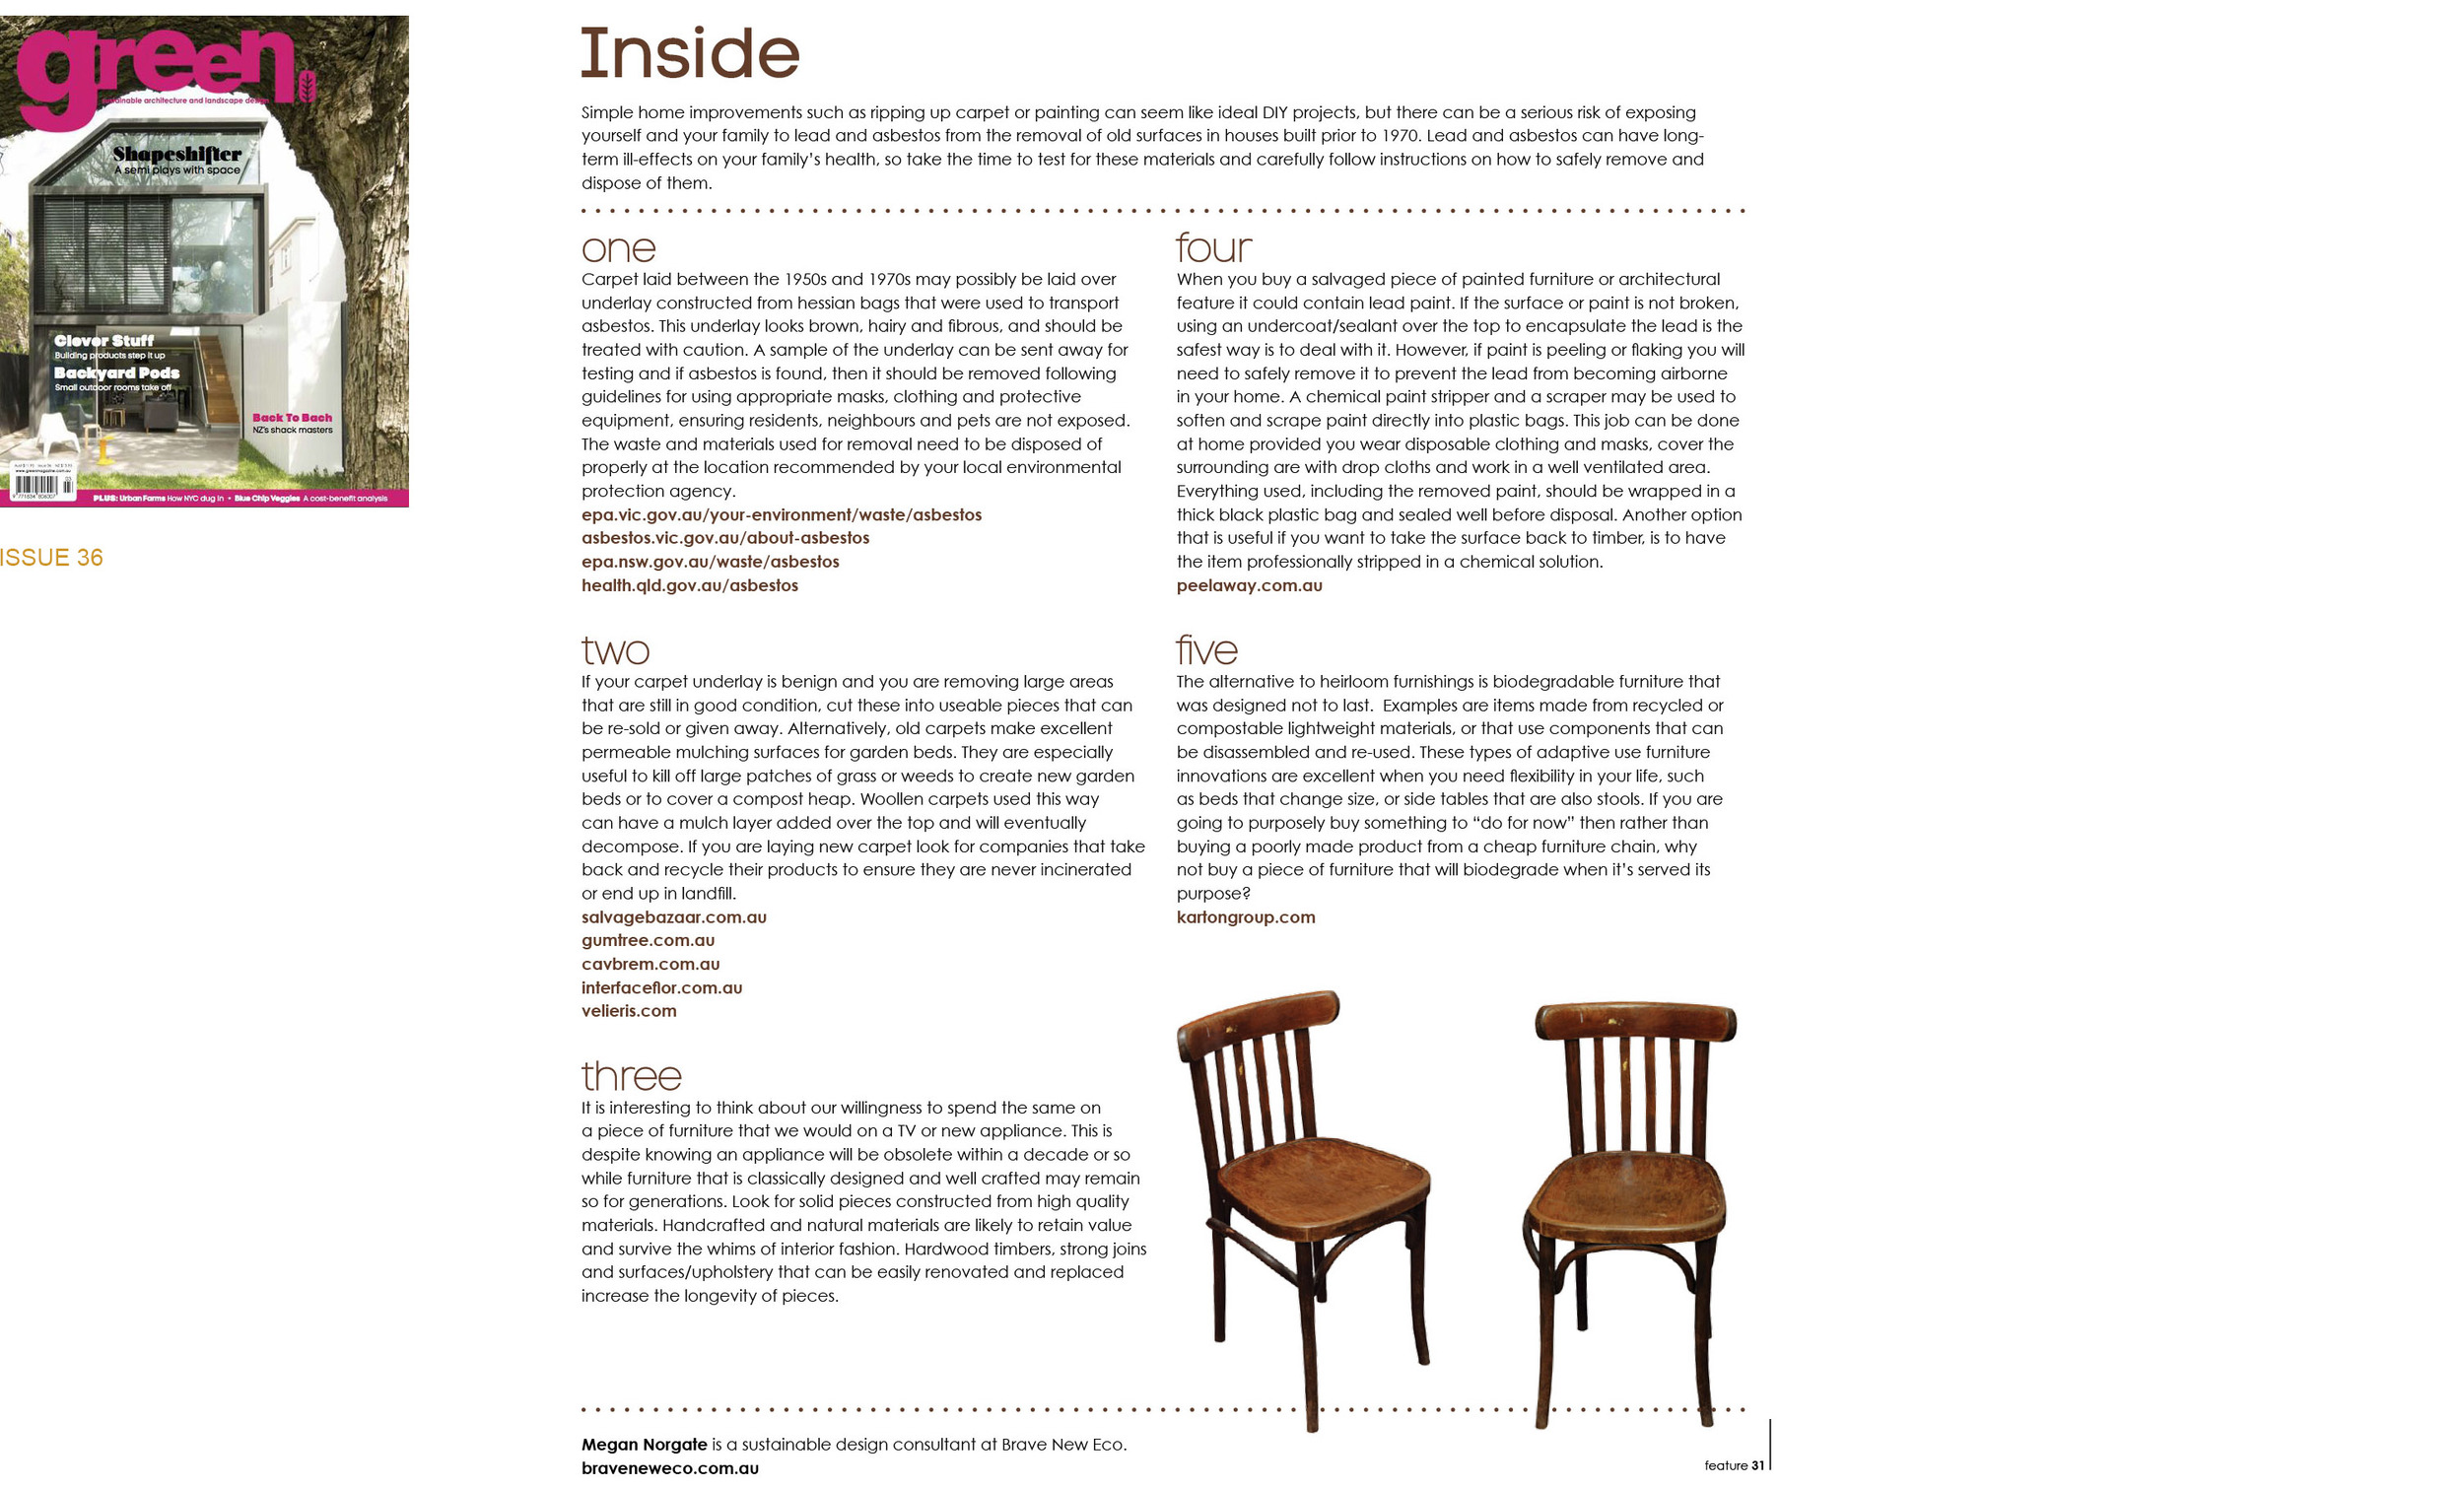 final_issue36.jpg